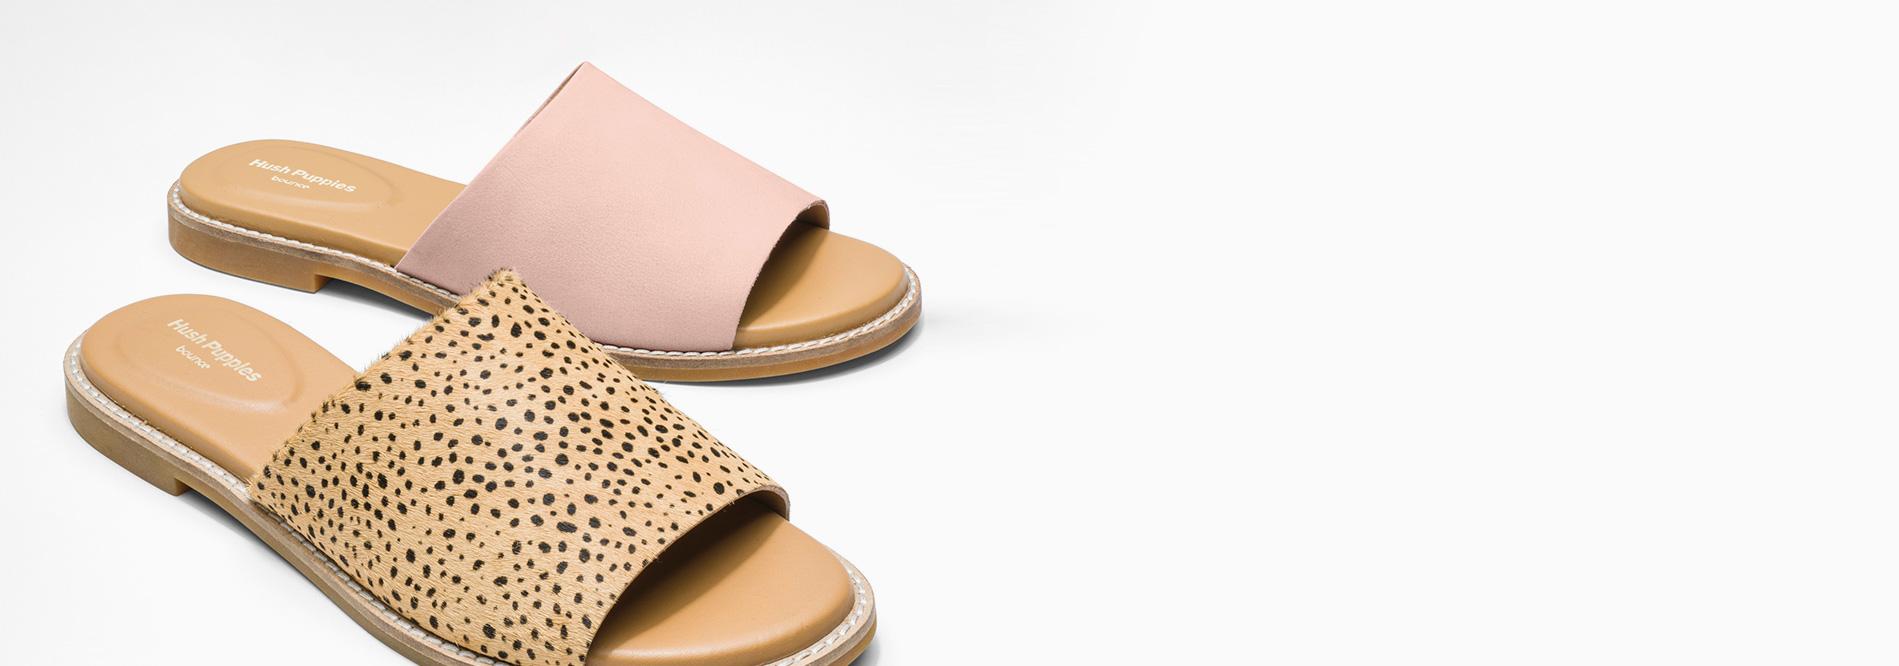 hush puppies women's shoes price